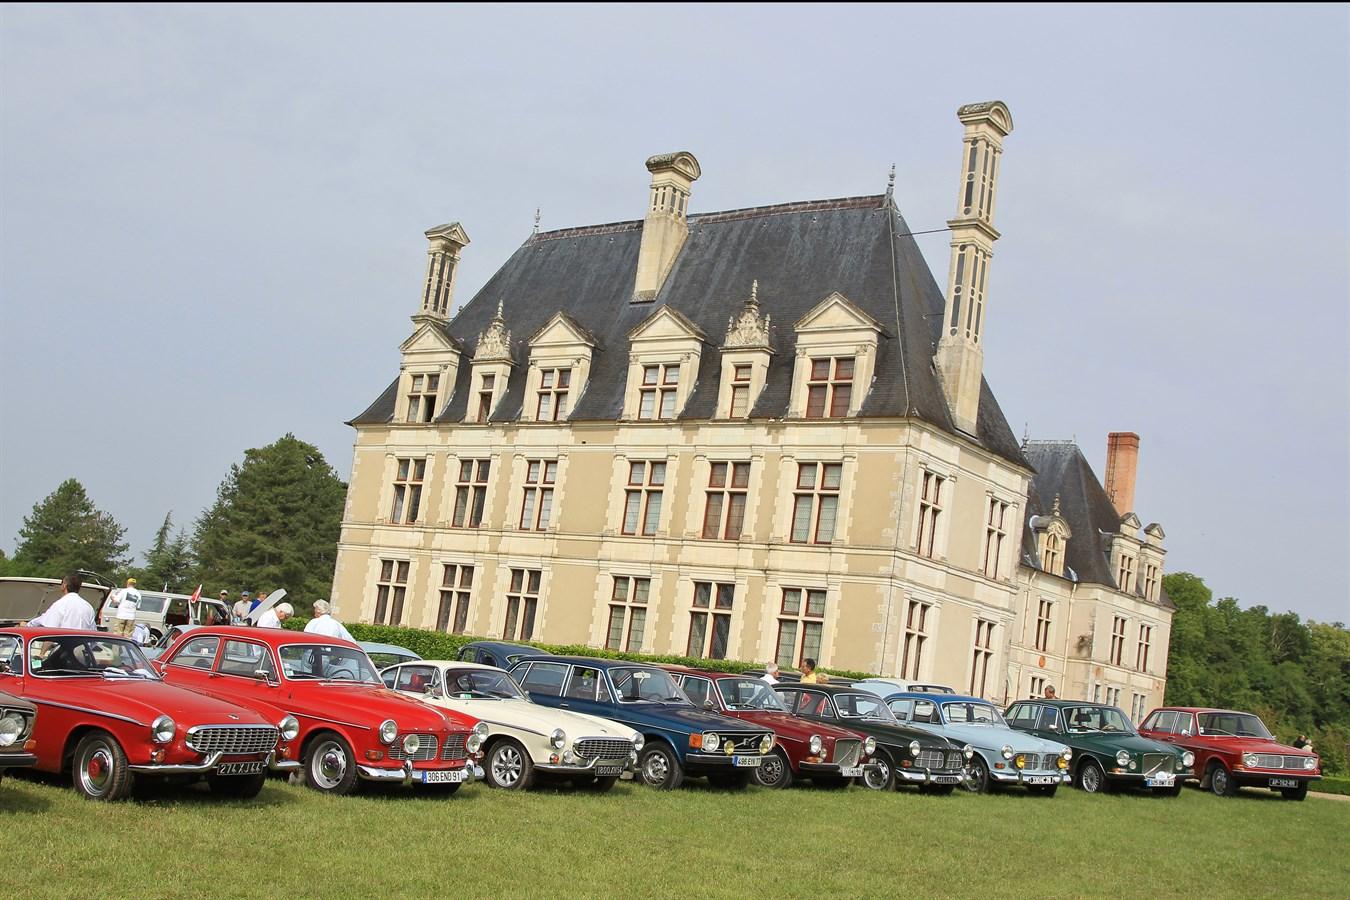 VIKING CLASSIC AUTO SHOW: L'EVENEMENT SUEDOIS 2010